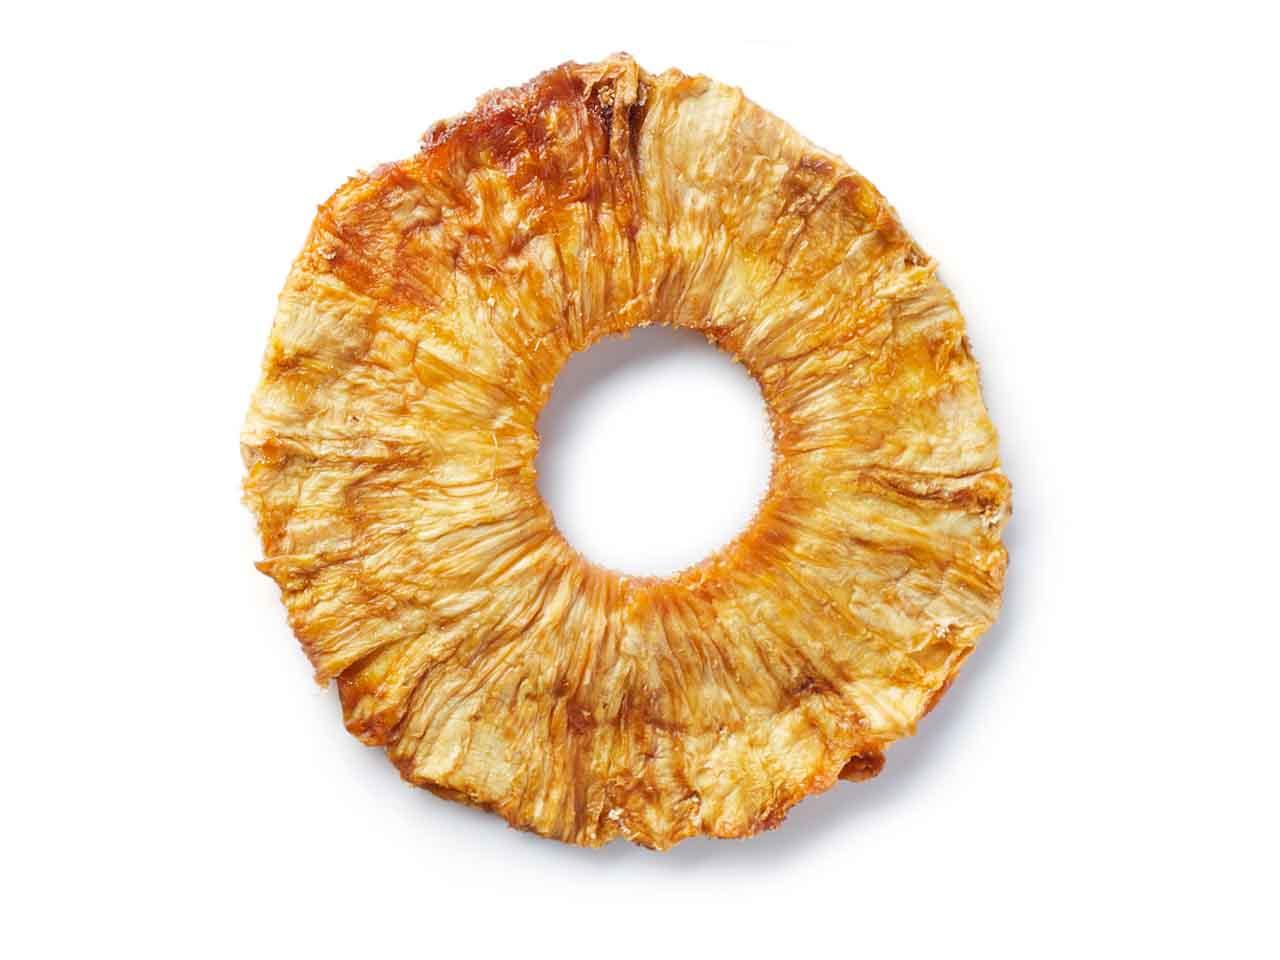 DriedPineapple